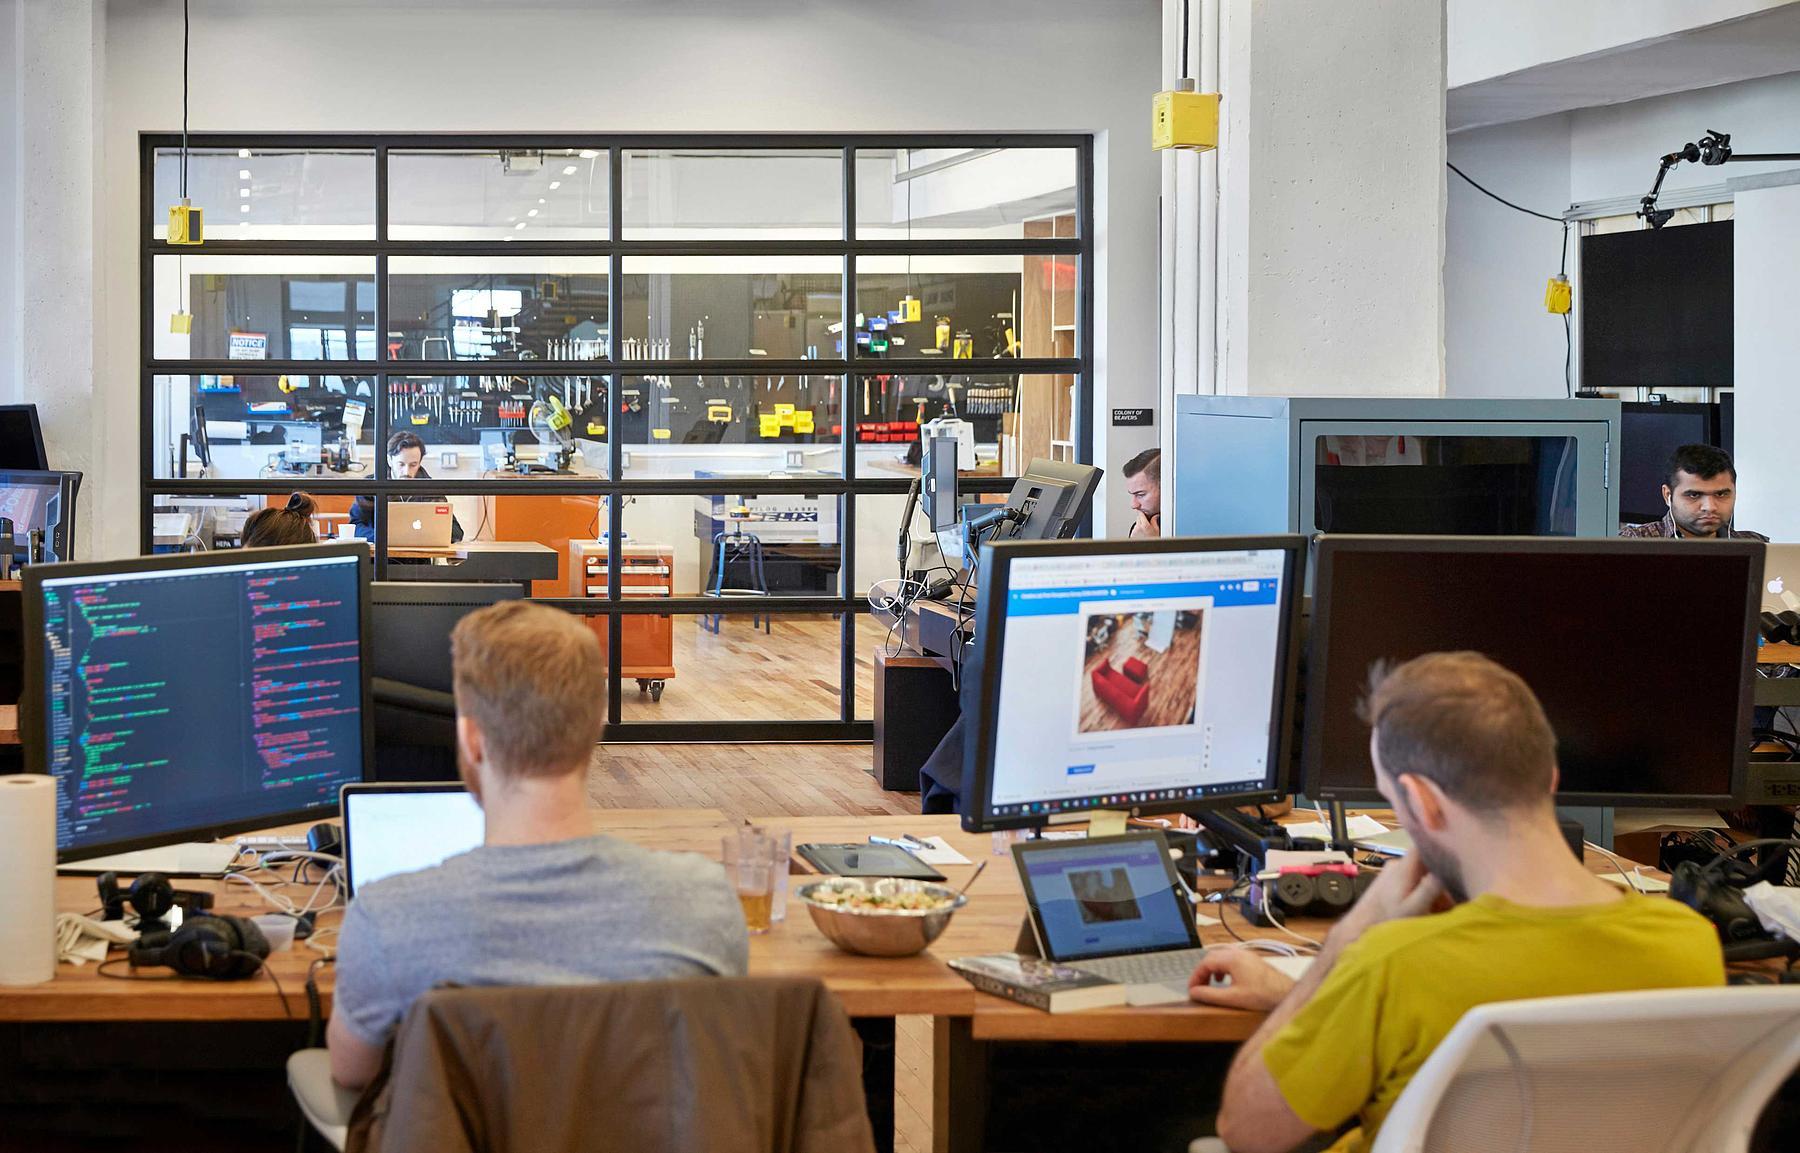 office tech york studio situ lab maker